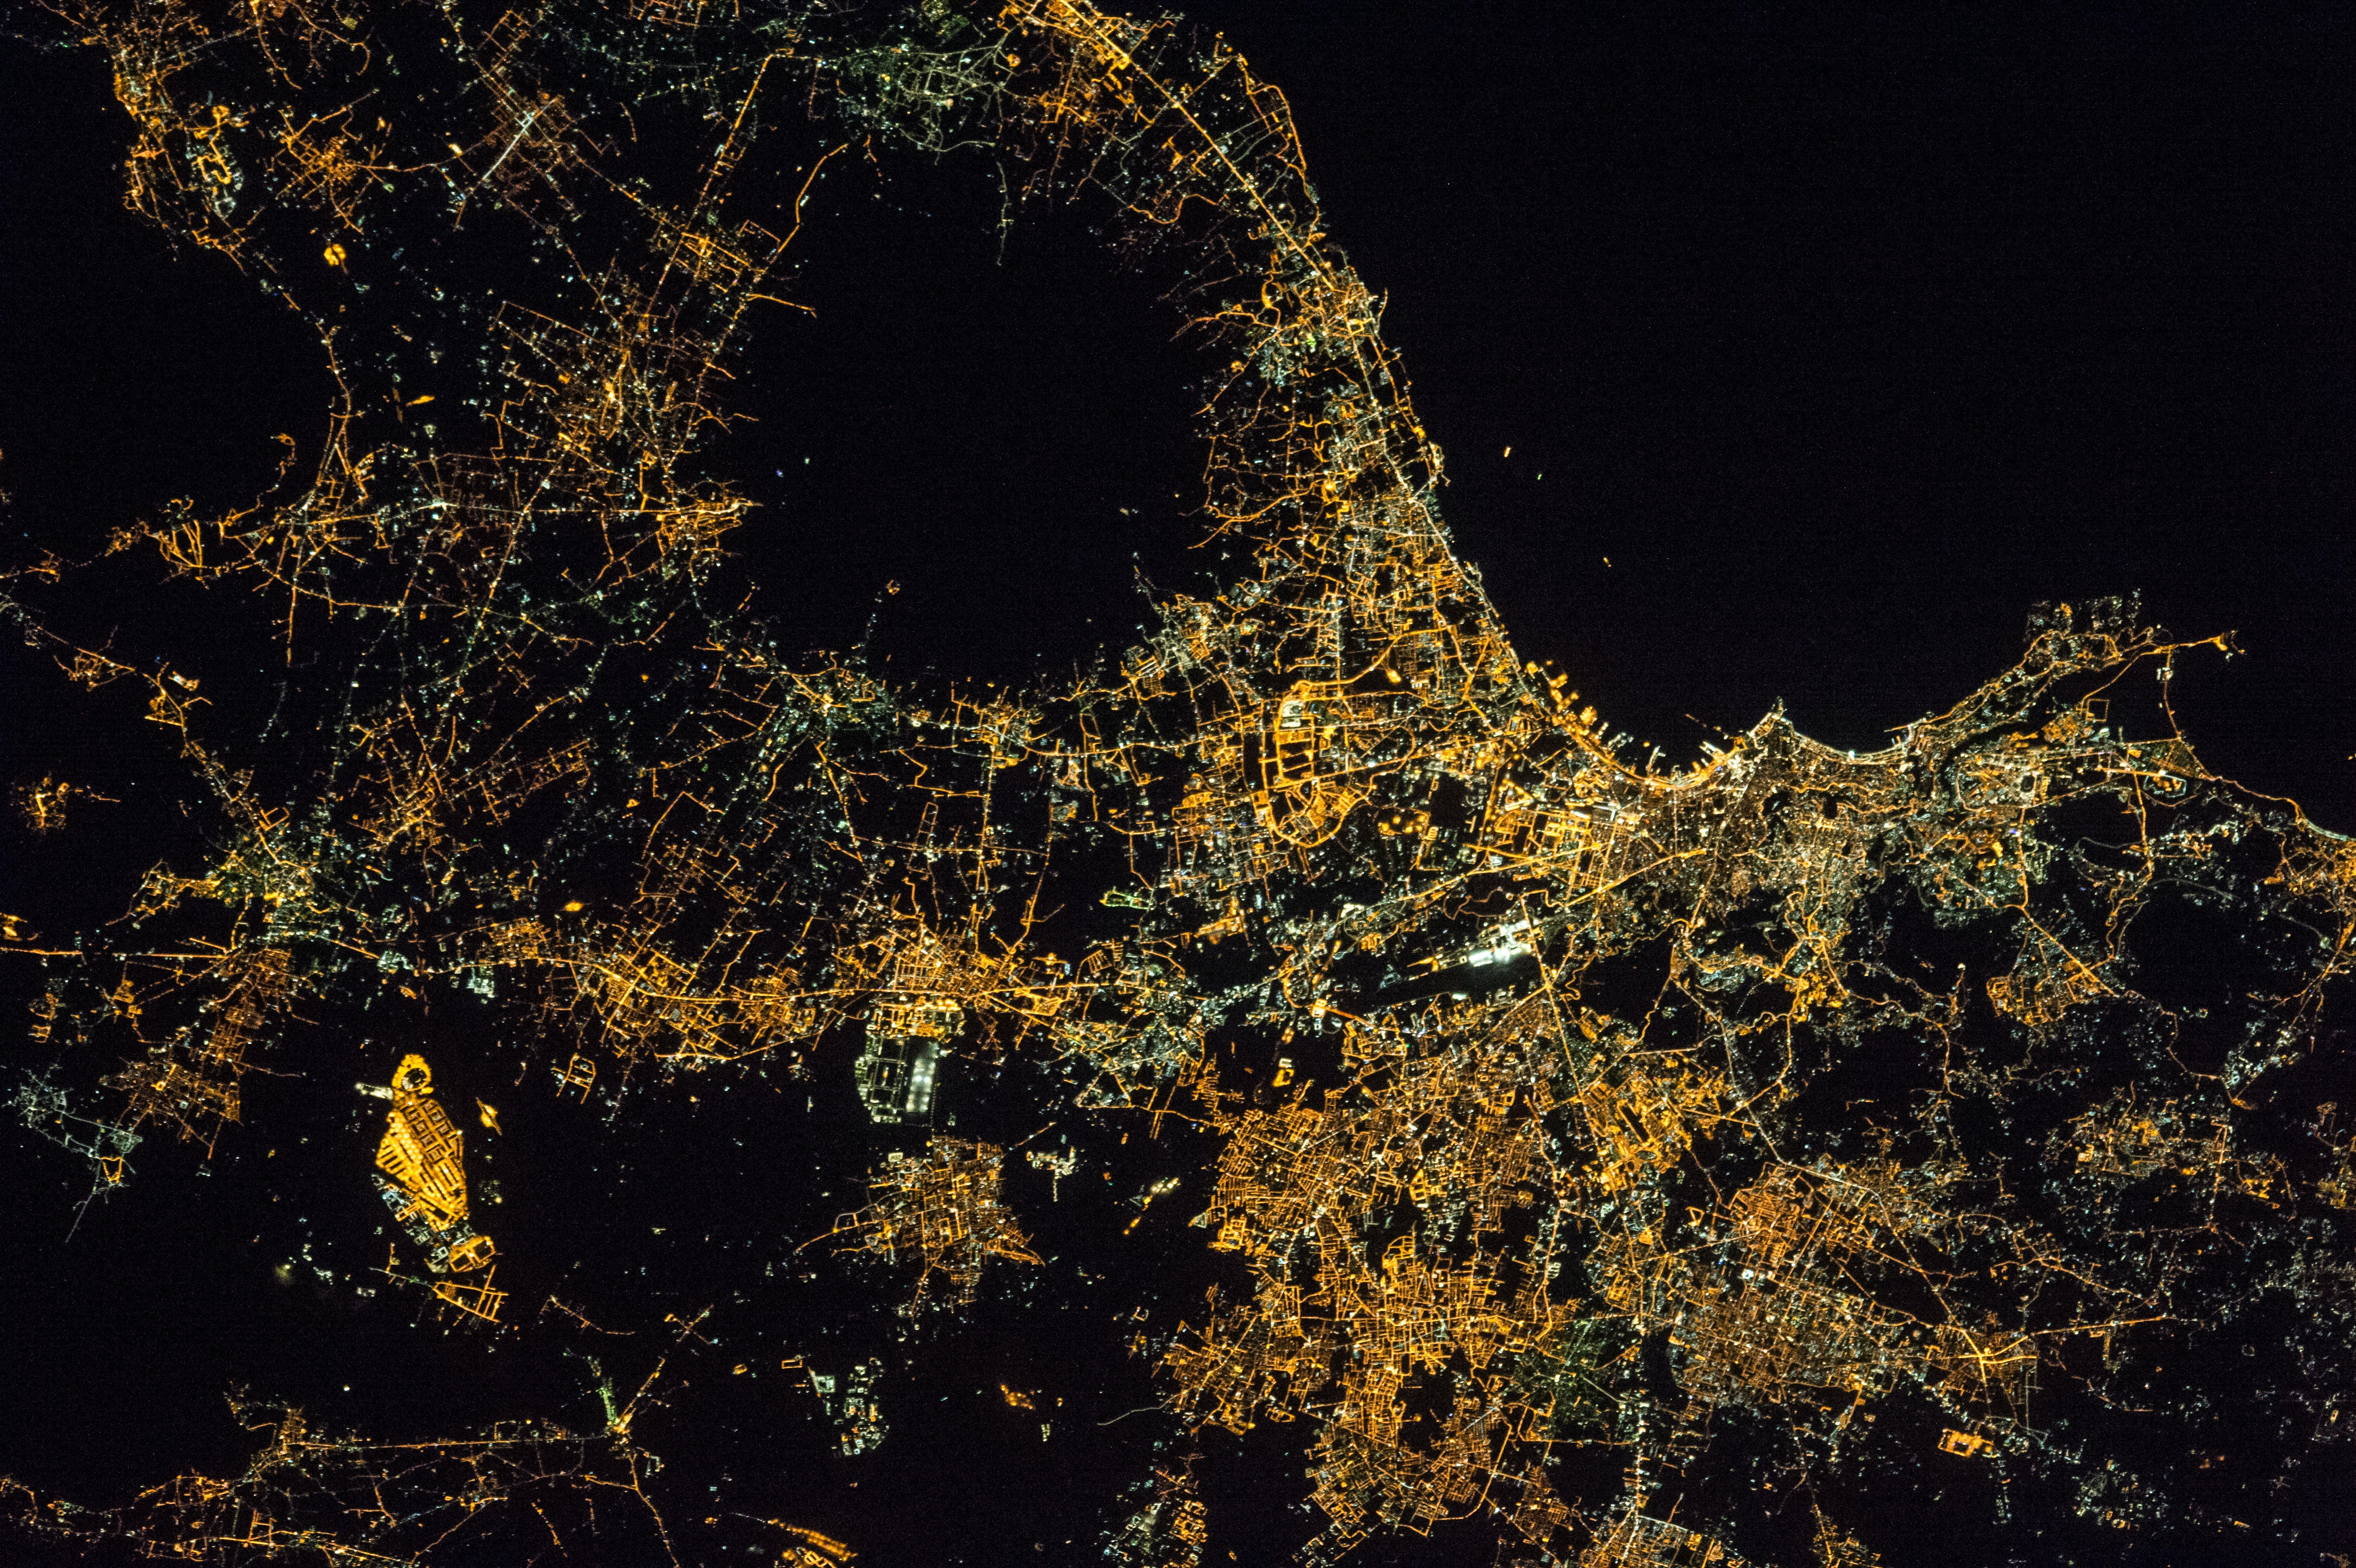 Naples and Mt. Vesuvius at Night. NASA Photo ID ISS050-E-37024